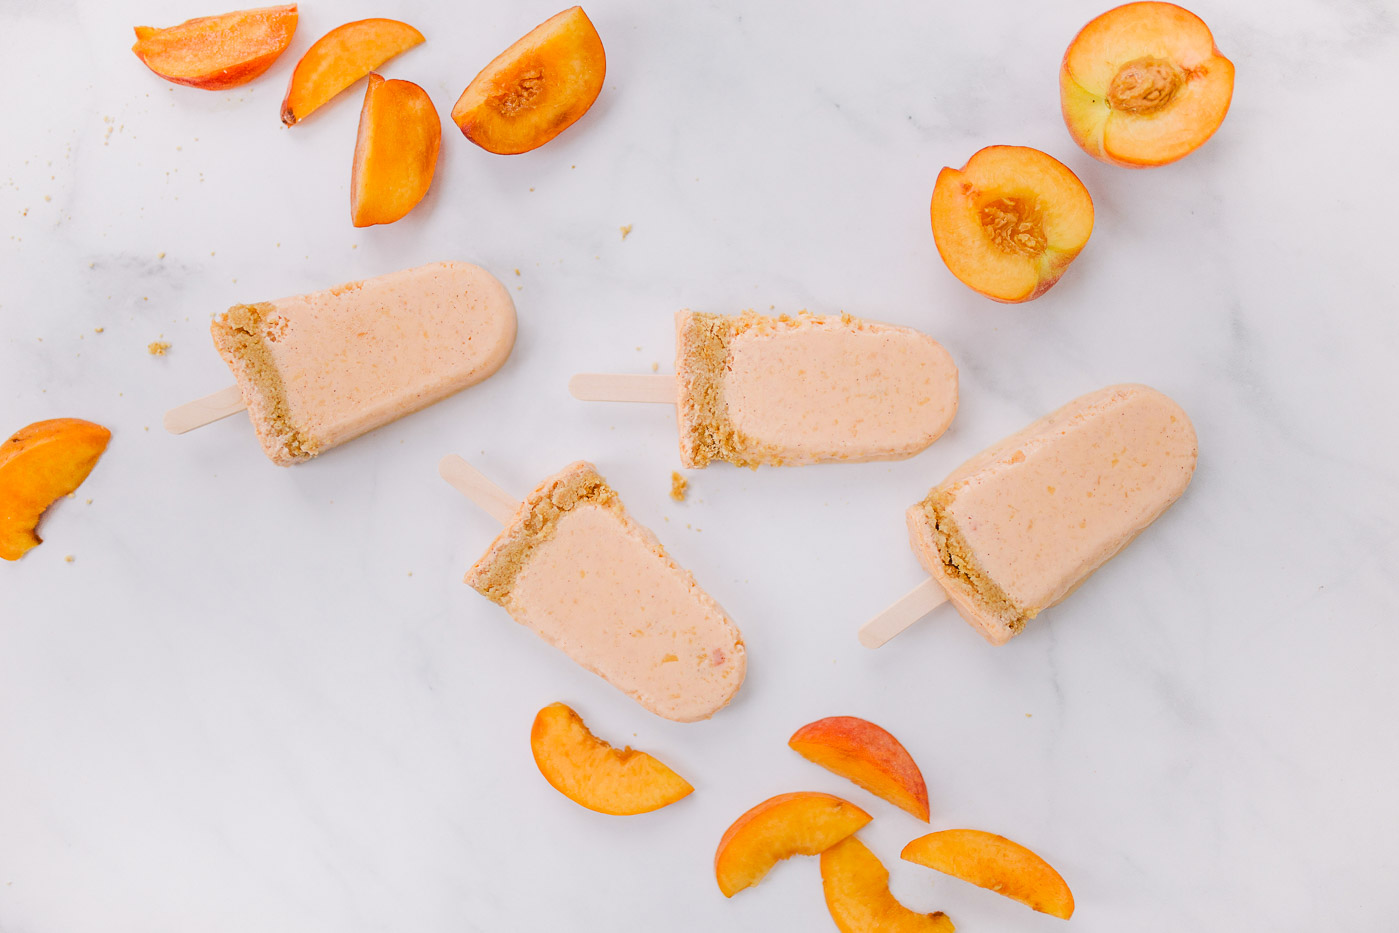 Peach cobbler popsicles by Southern Lifestyle expert Lauren Cermak.